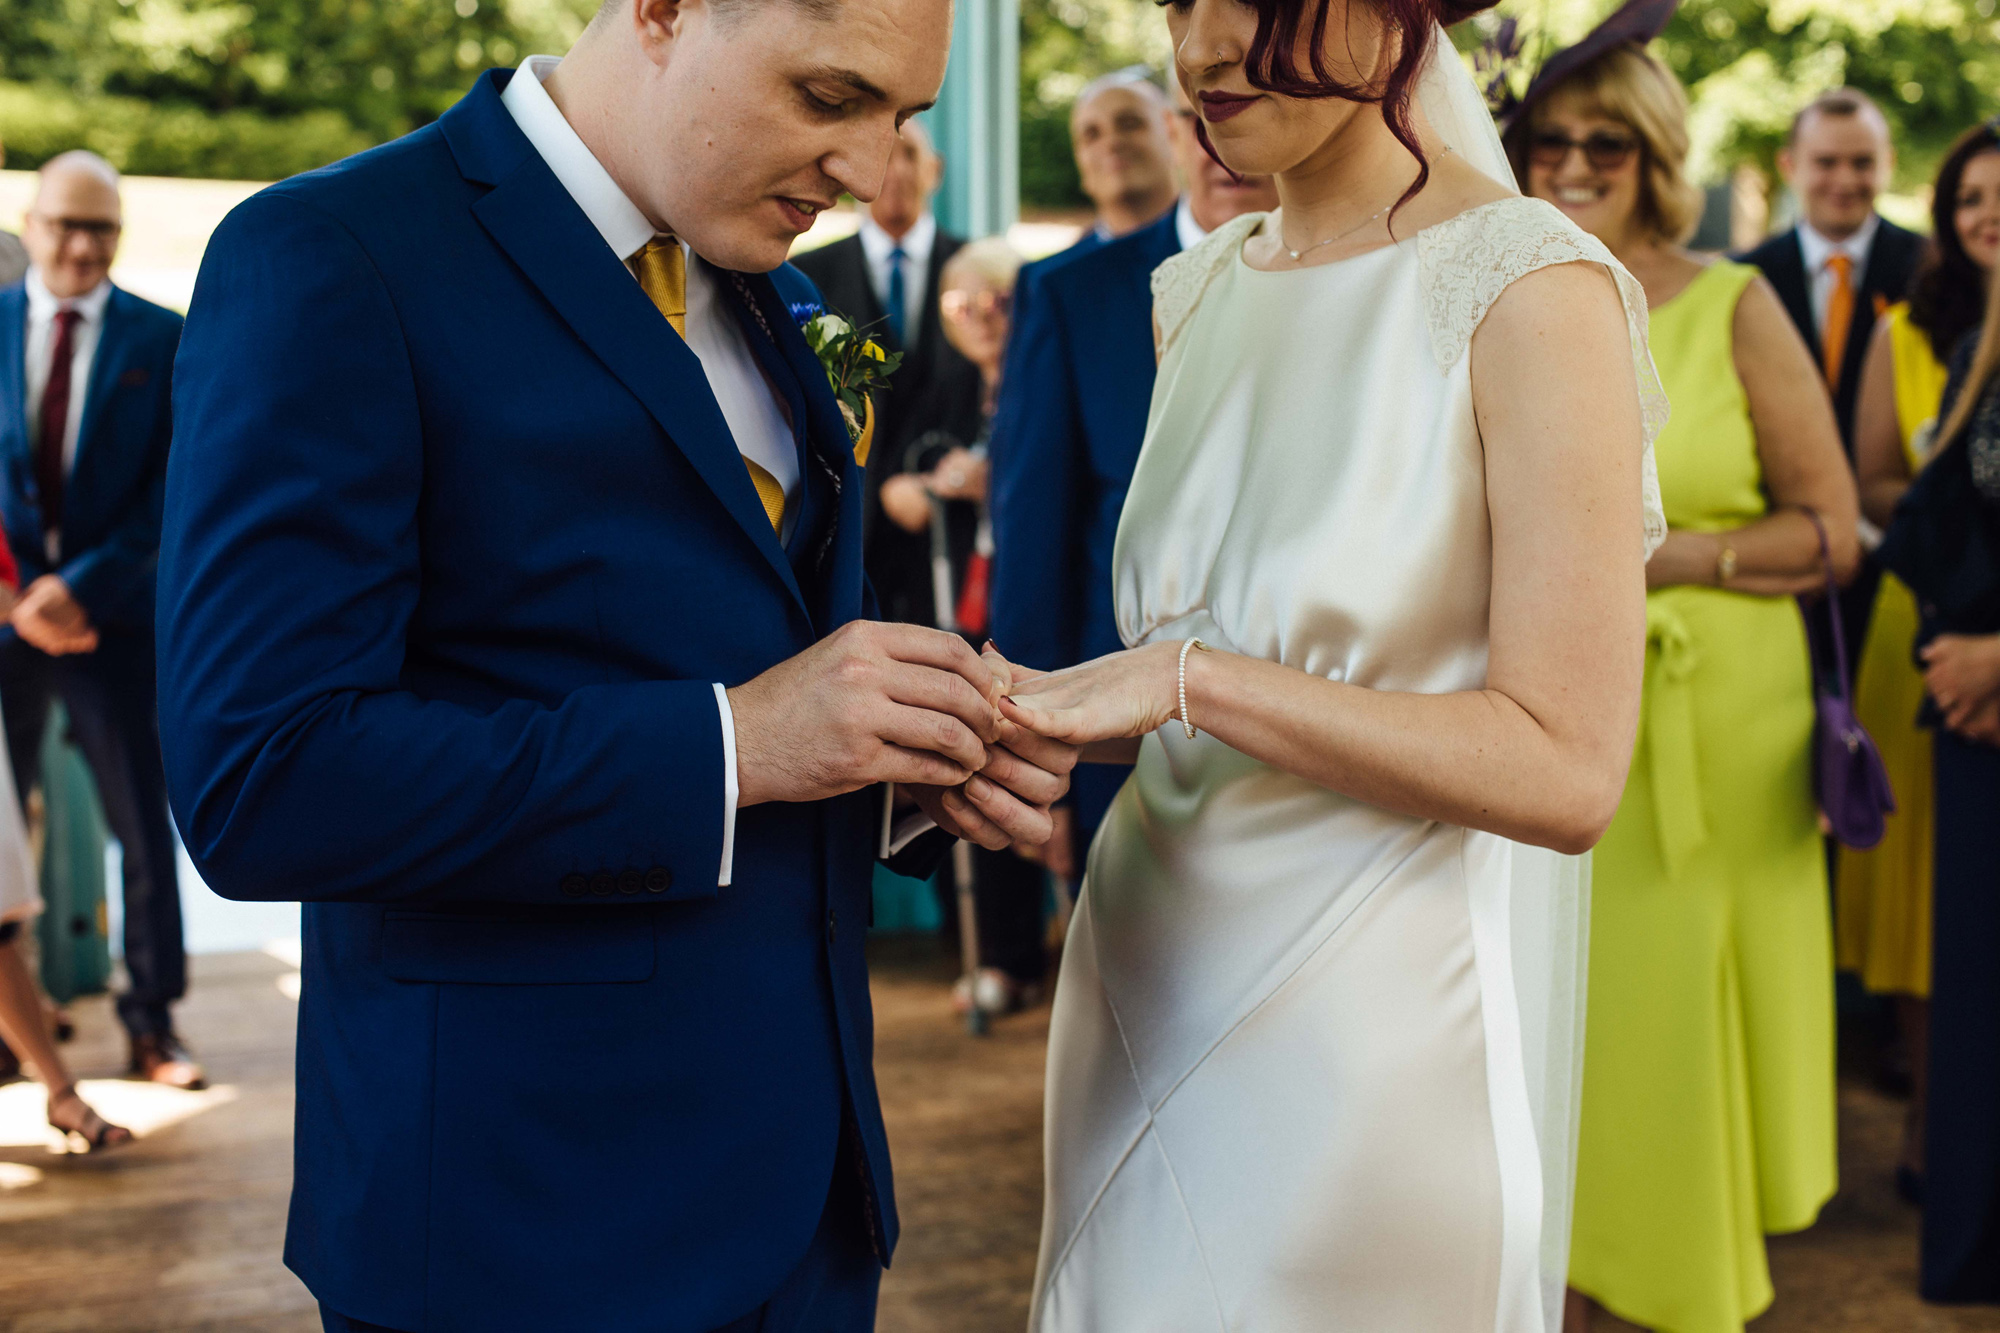 Sarah-Honeysuckle-Bias-Cut-Silk-Vintage-Inspired-Wedding-Gown-Sheffield-Wedding-Kate-Beaumont-18.jpg